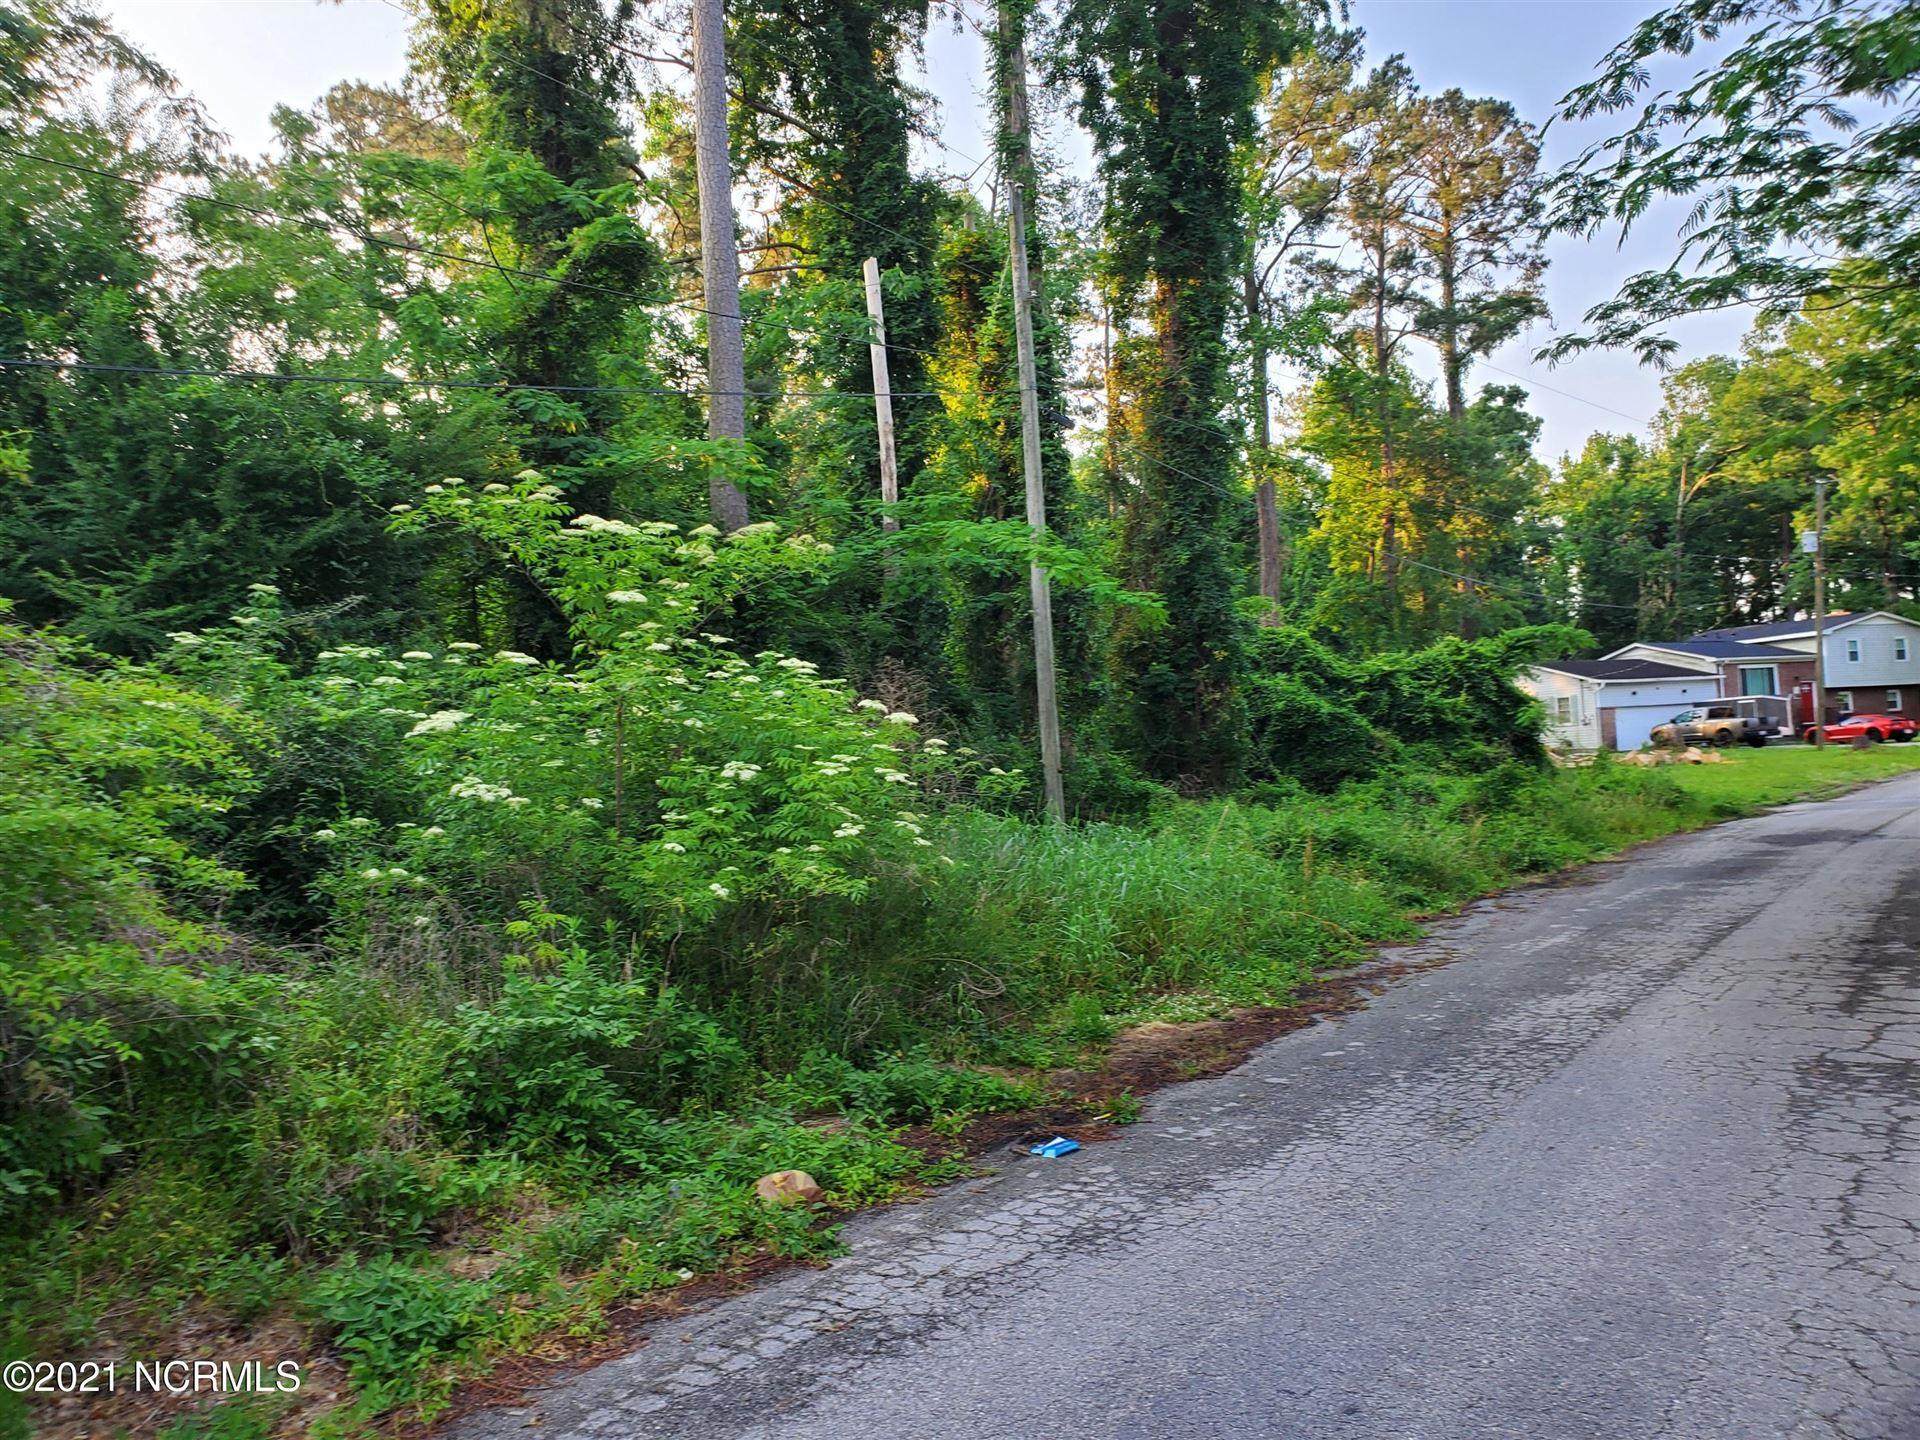 Photo of 124 Jupiter Trail, Jacksonville, NC 28546 (MLS # 100275744)